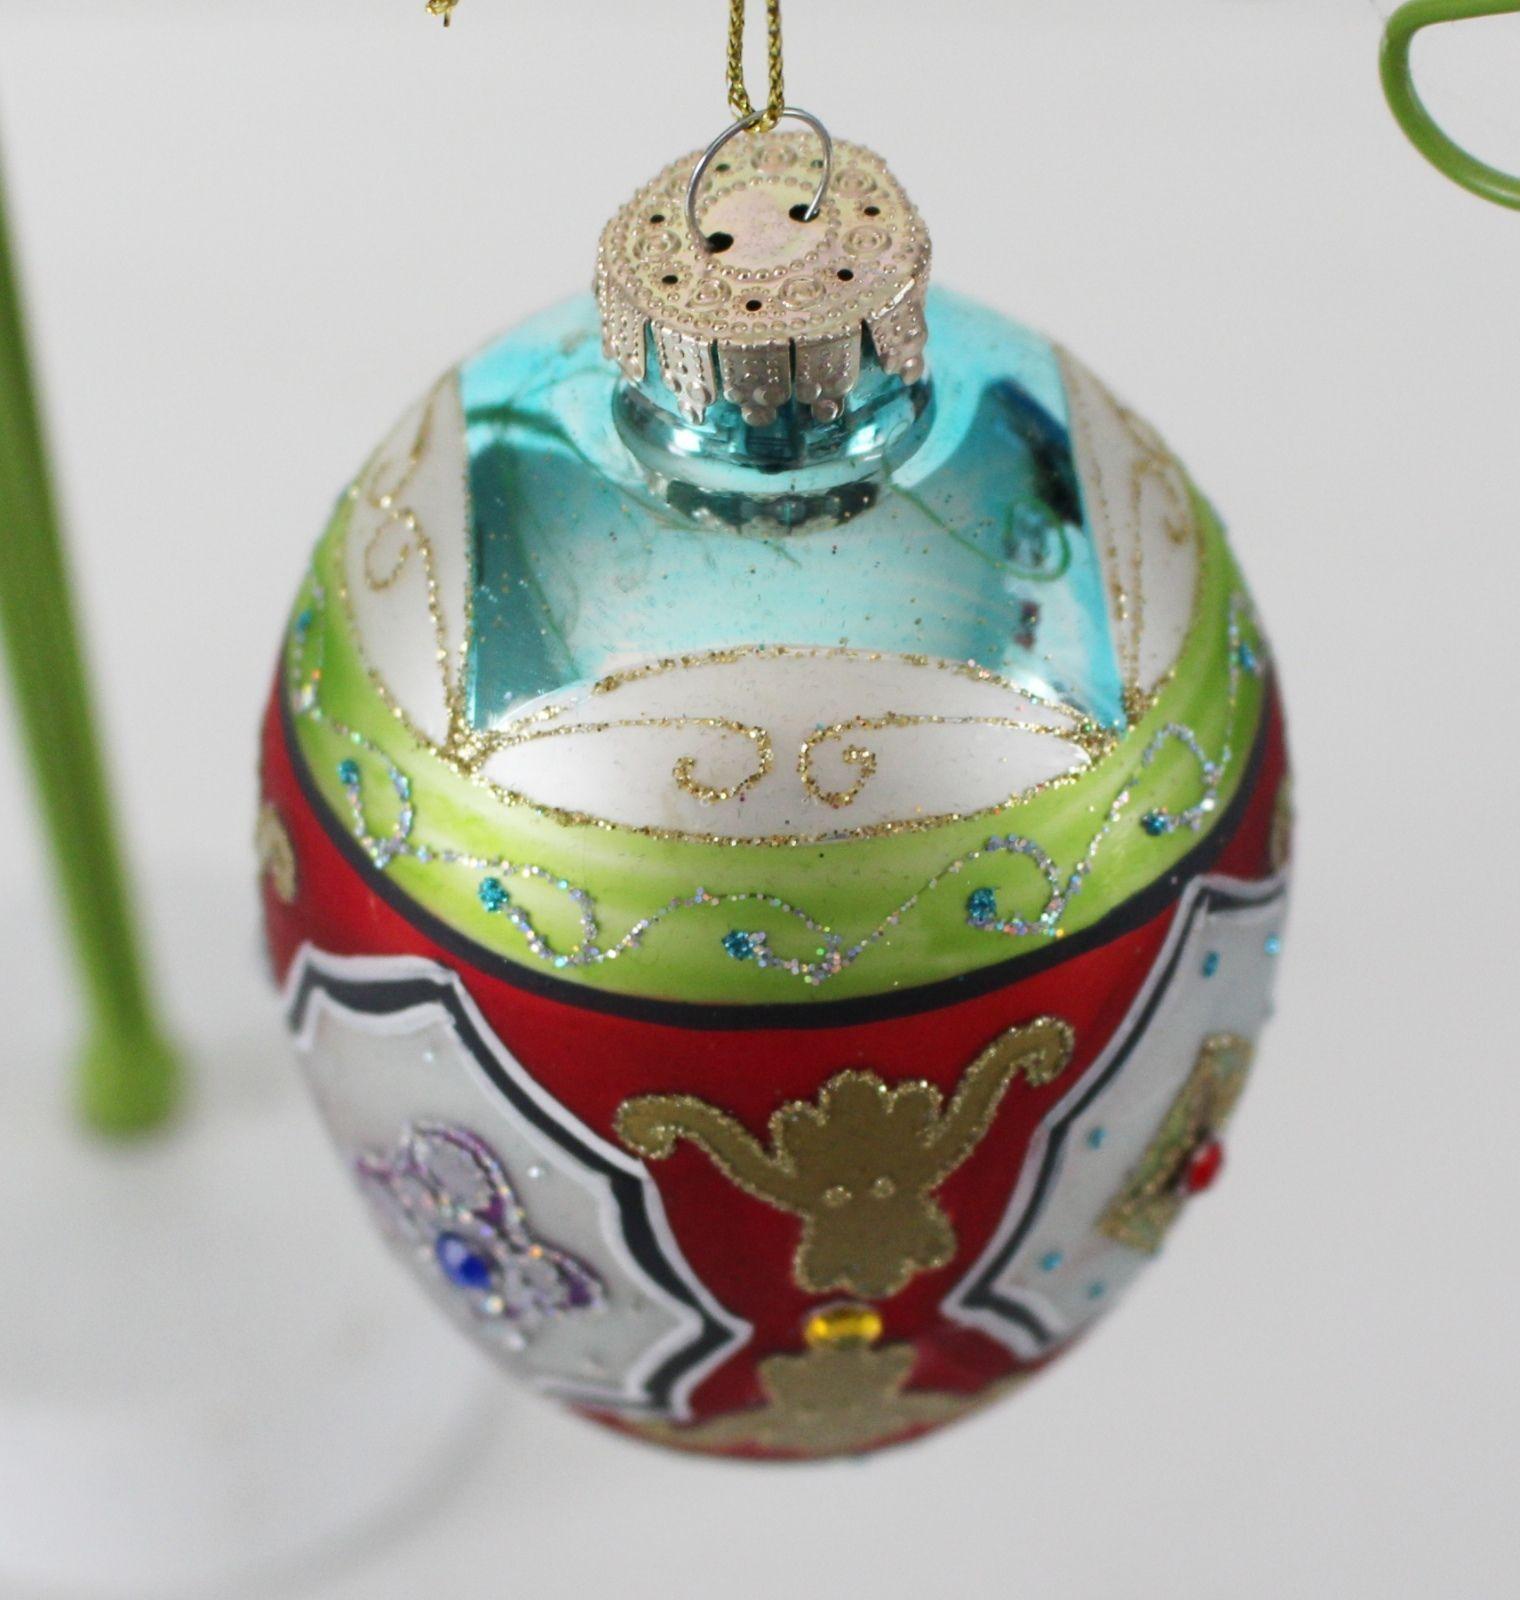 Dept 56 Christmas Ornament Department Glass 2010 807393 ...